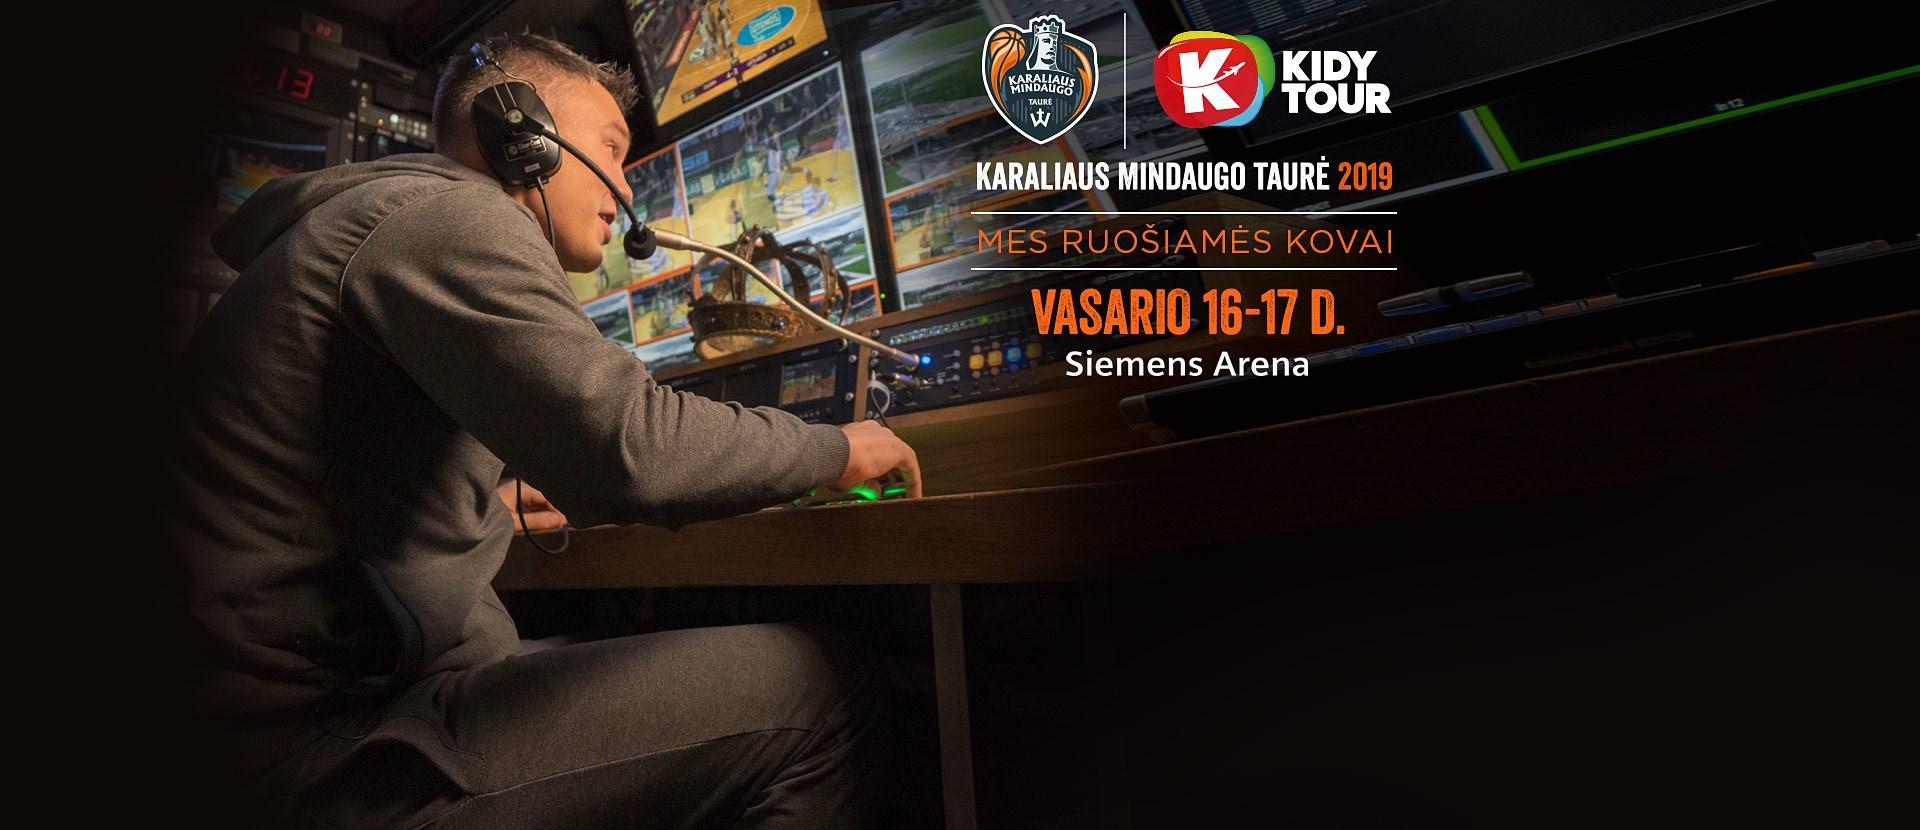 """Kidy Tour"" Karaliaus Mindaugo taurė 2019"